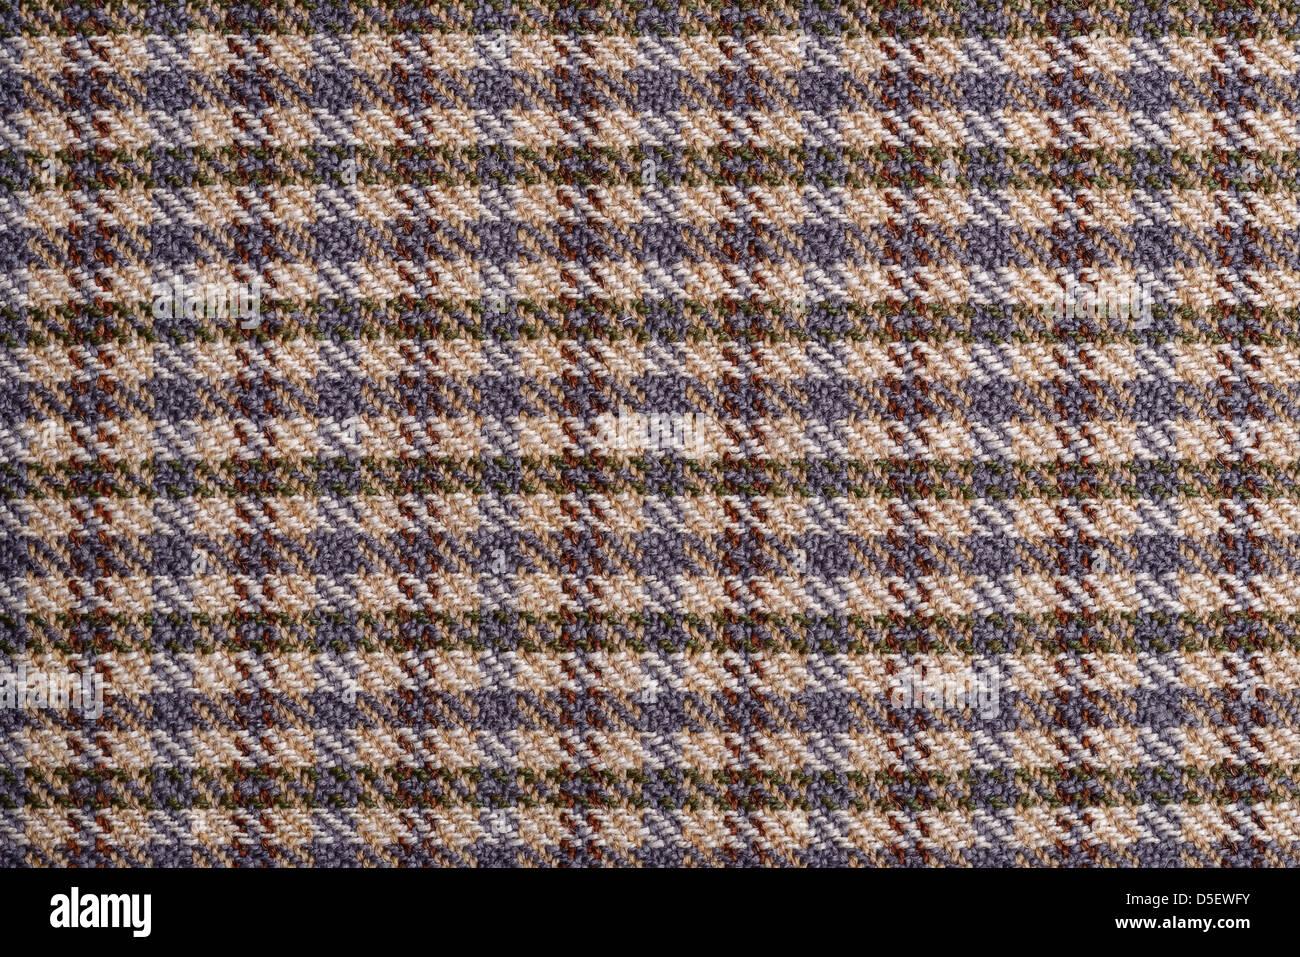 Wool tweed fabric detail - Stock Image